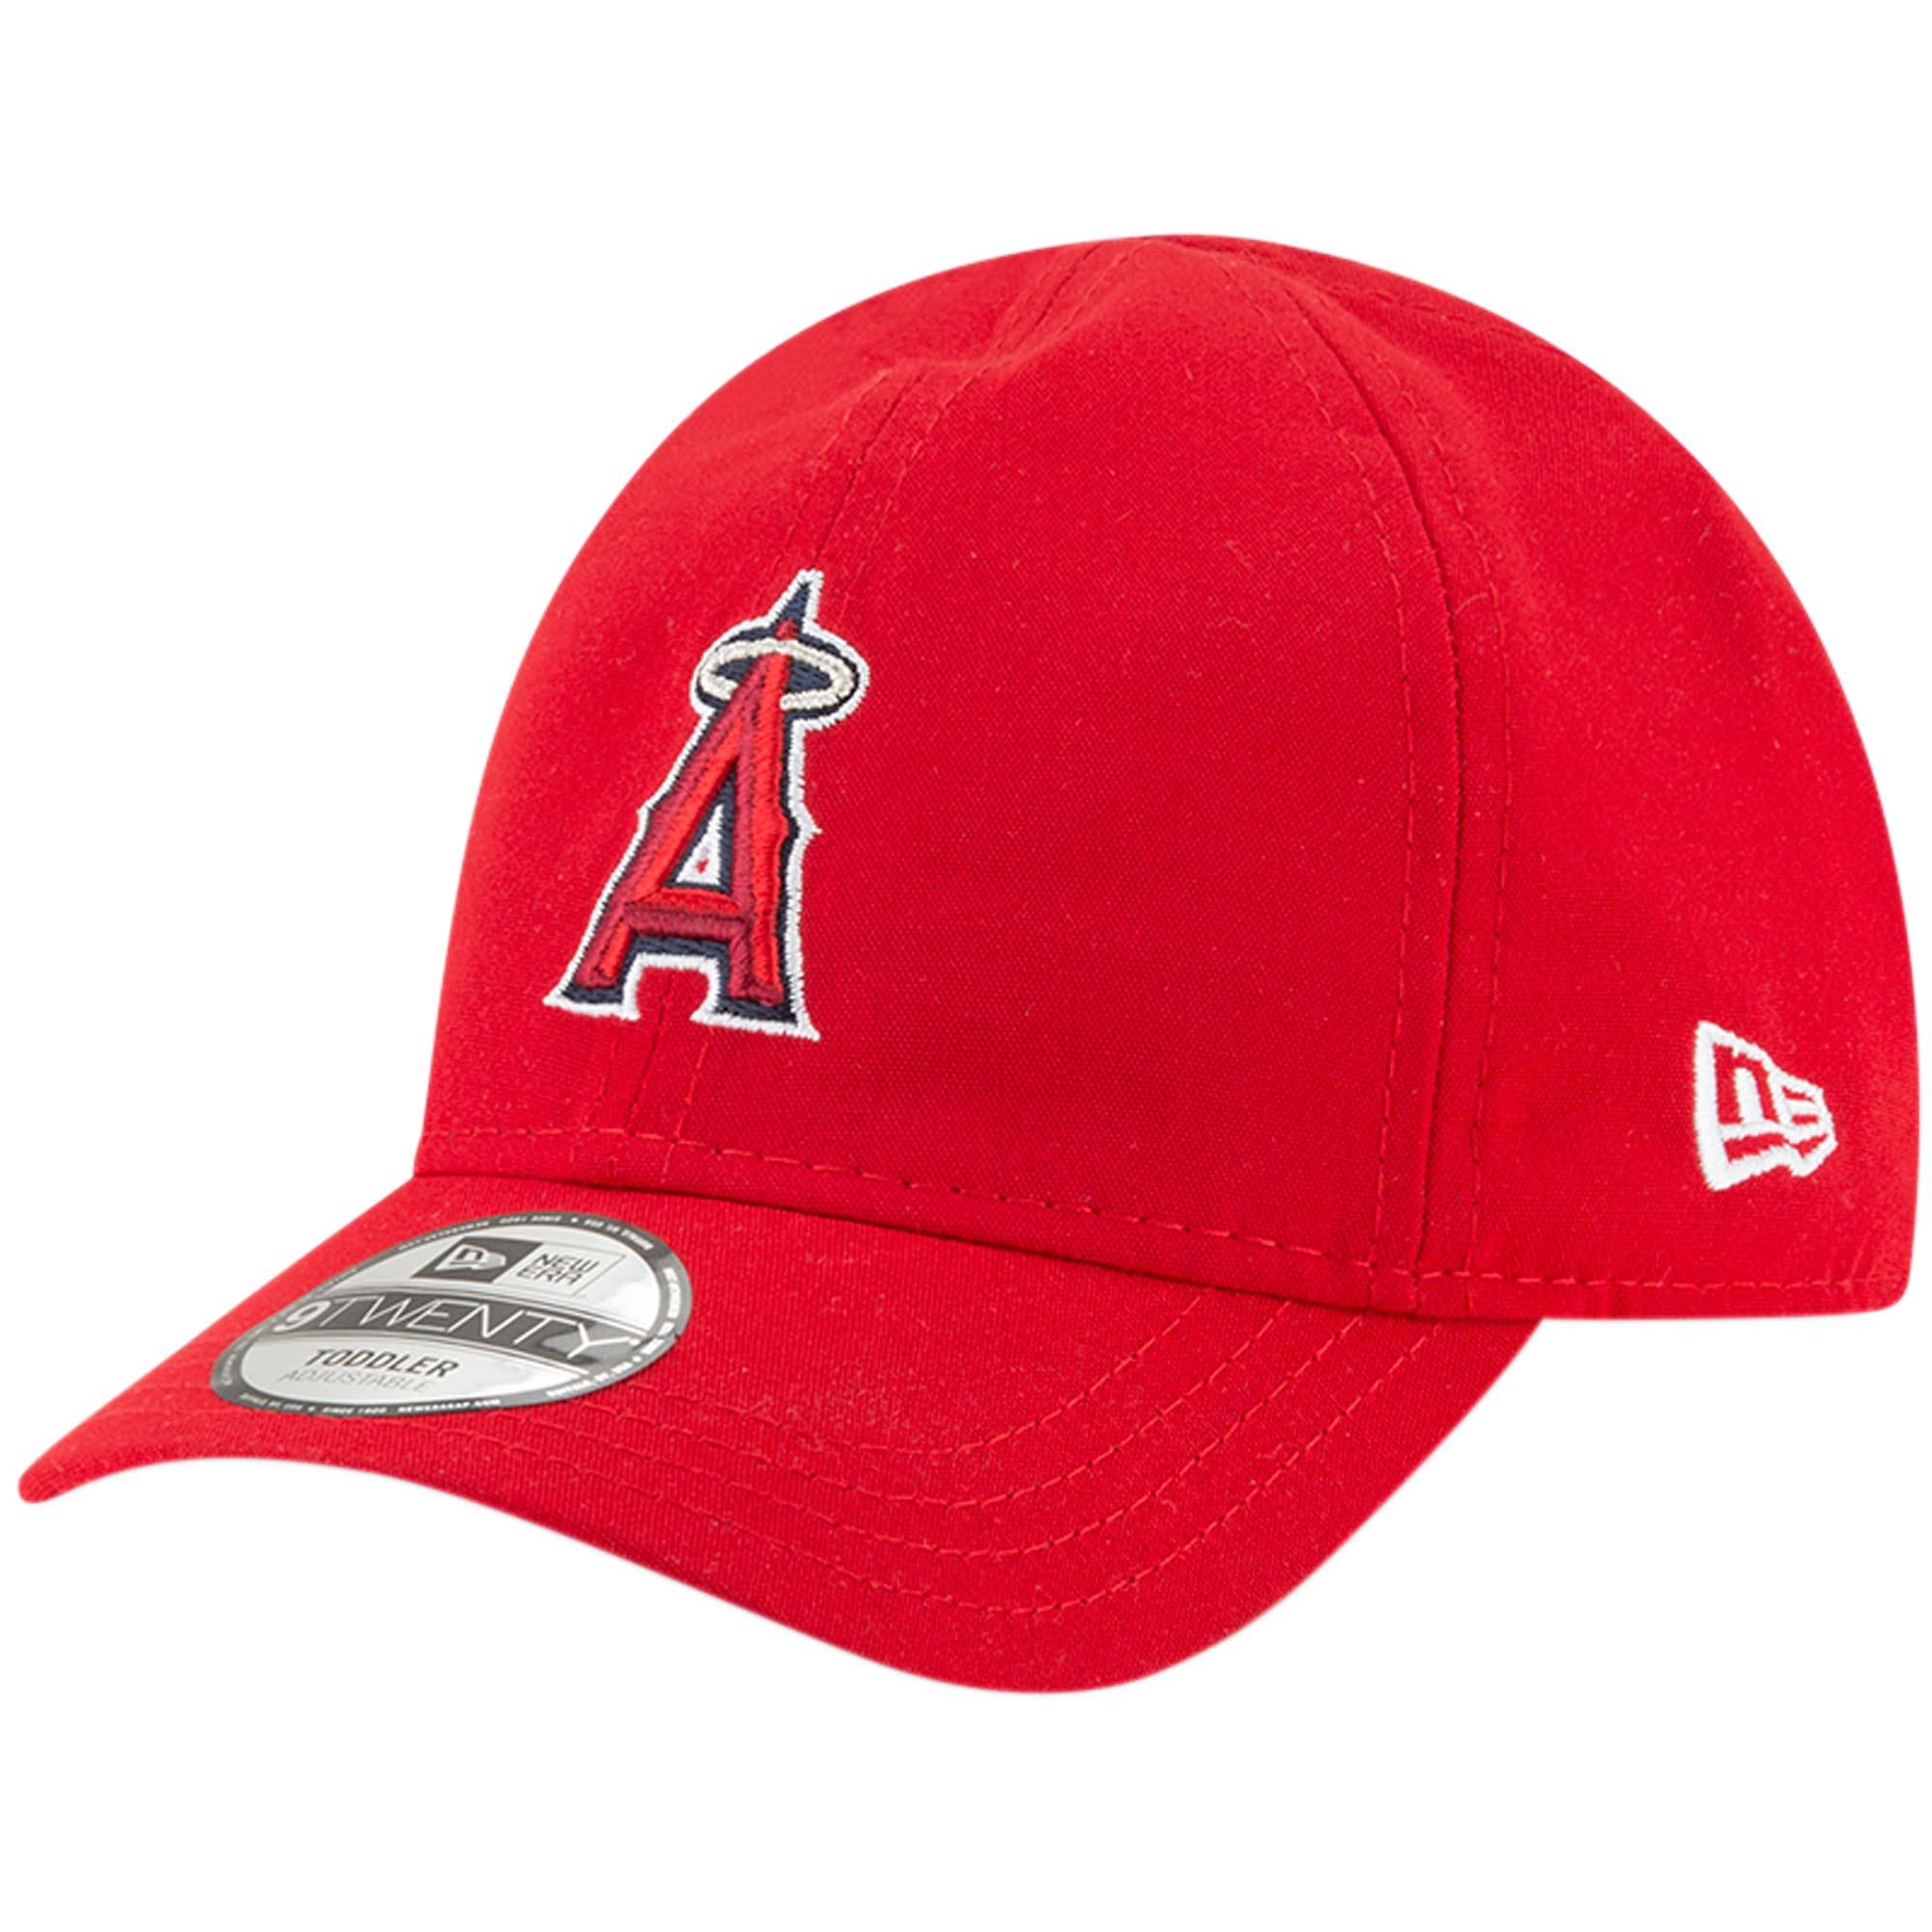 Los Angeles Angels New Era Toddler My 1st 9TWENTY Adjustable Hat - Red - OSFA